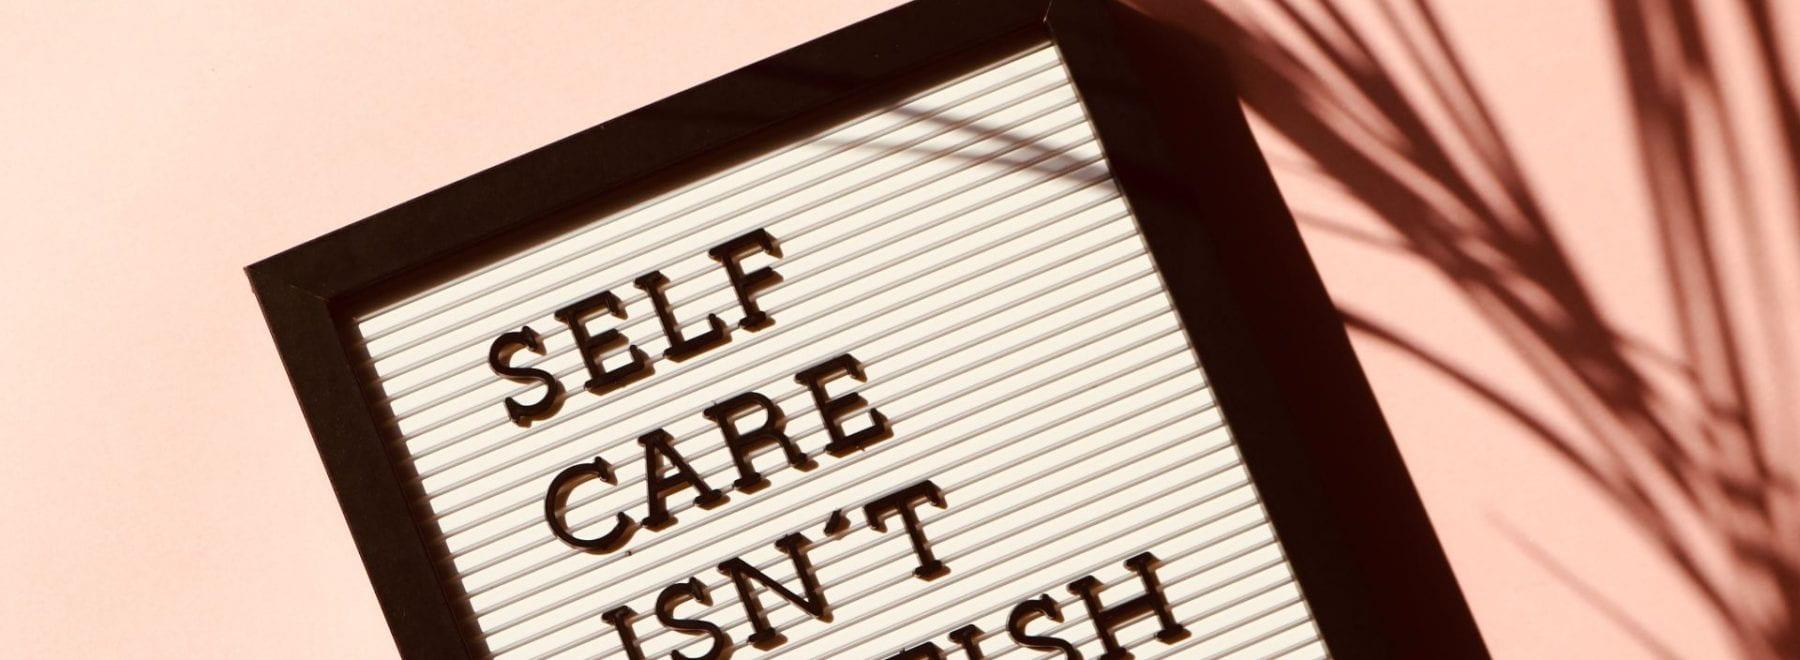 A board that reads 'self care isn't selfish'